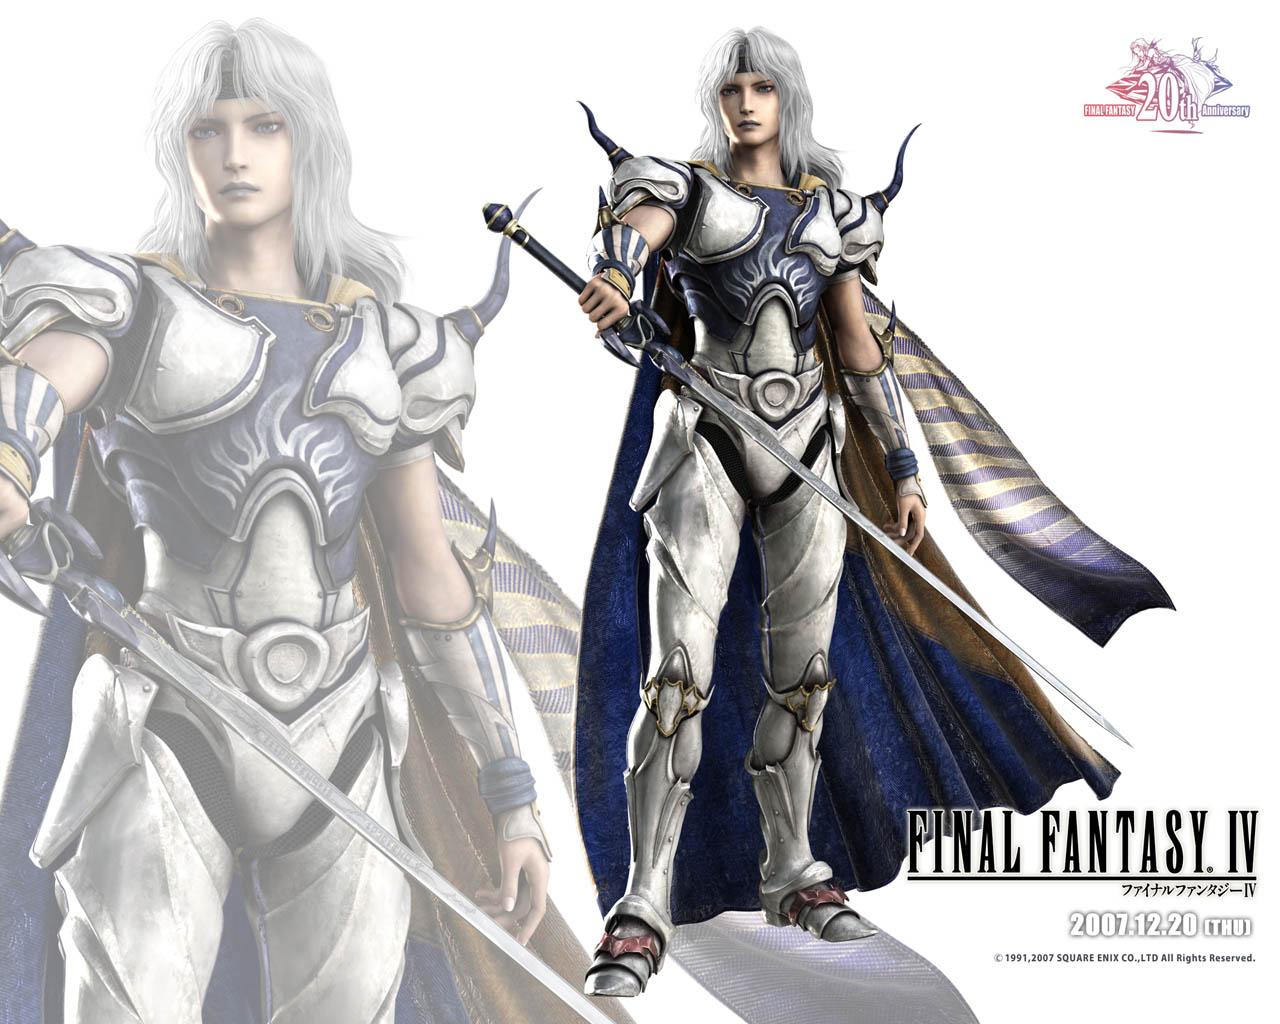 Final Fantasy IV wallpapers | Final Fantasy Wiki | Fandom powered